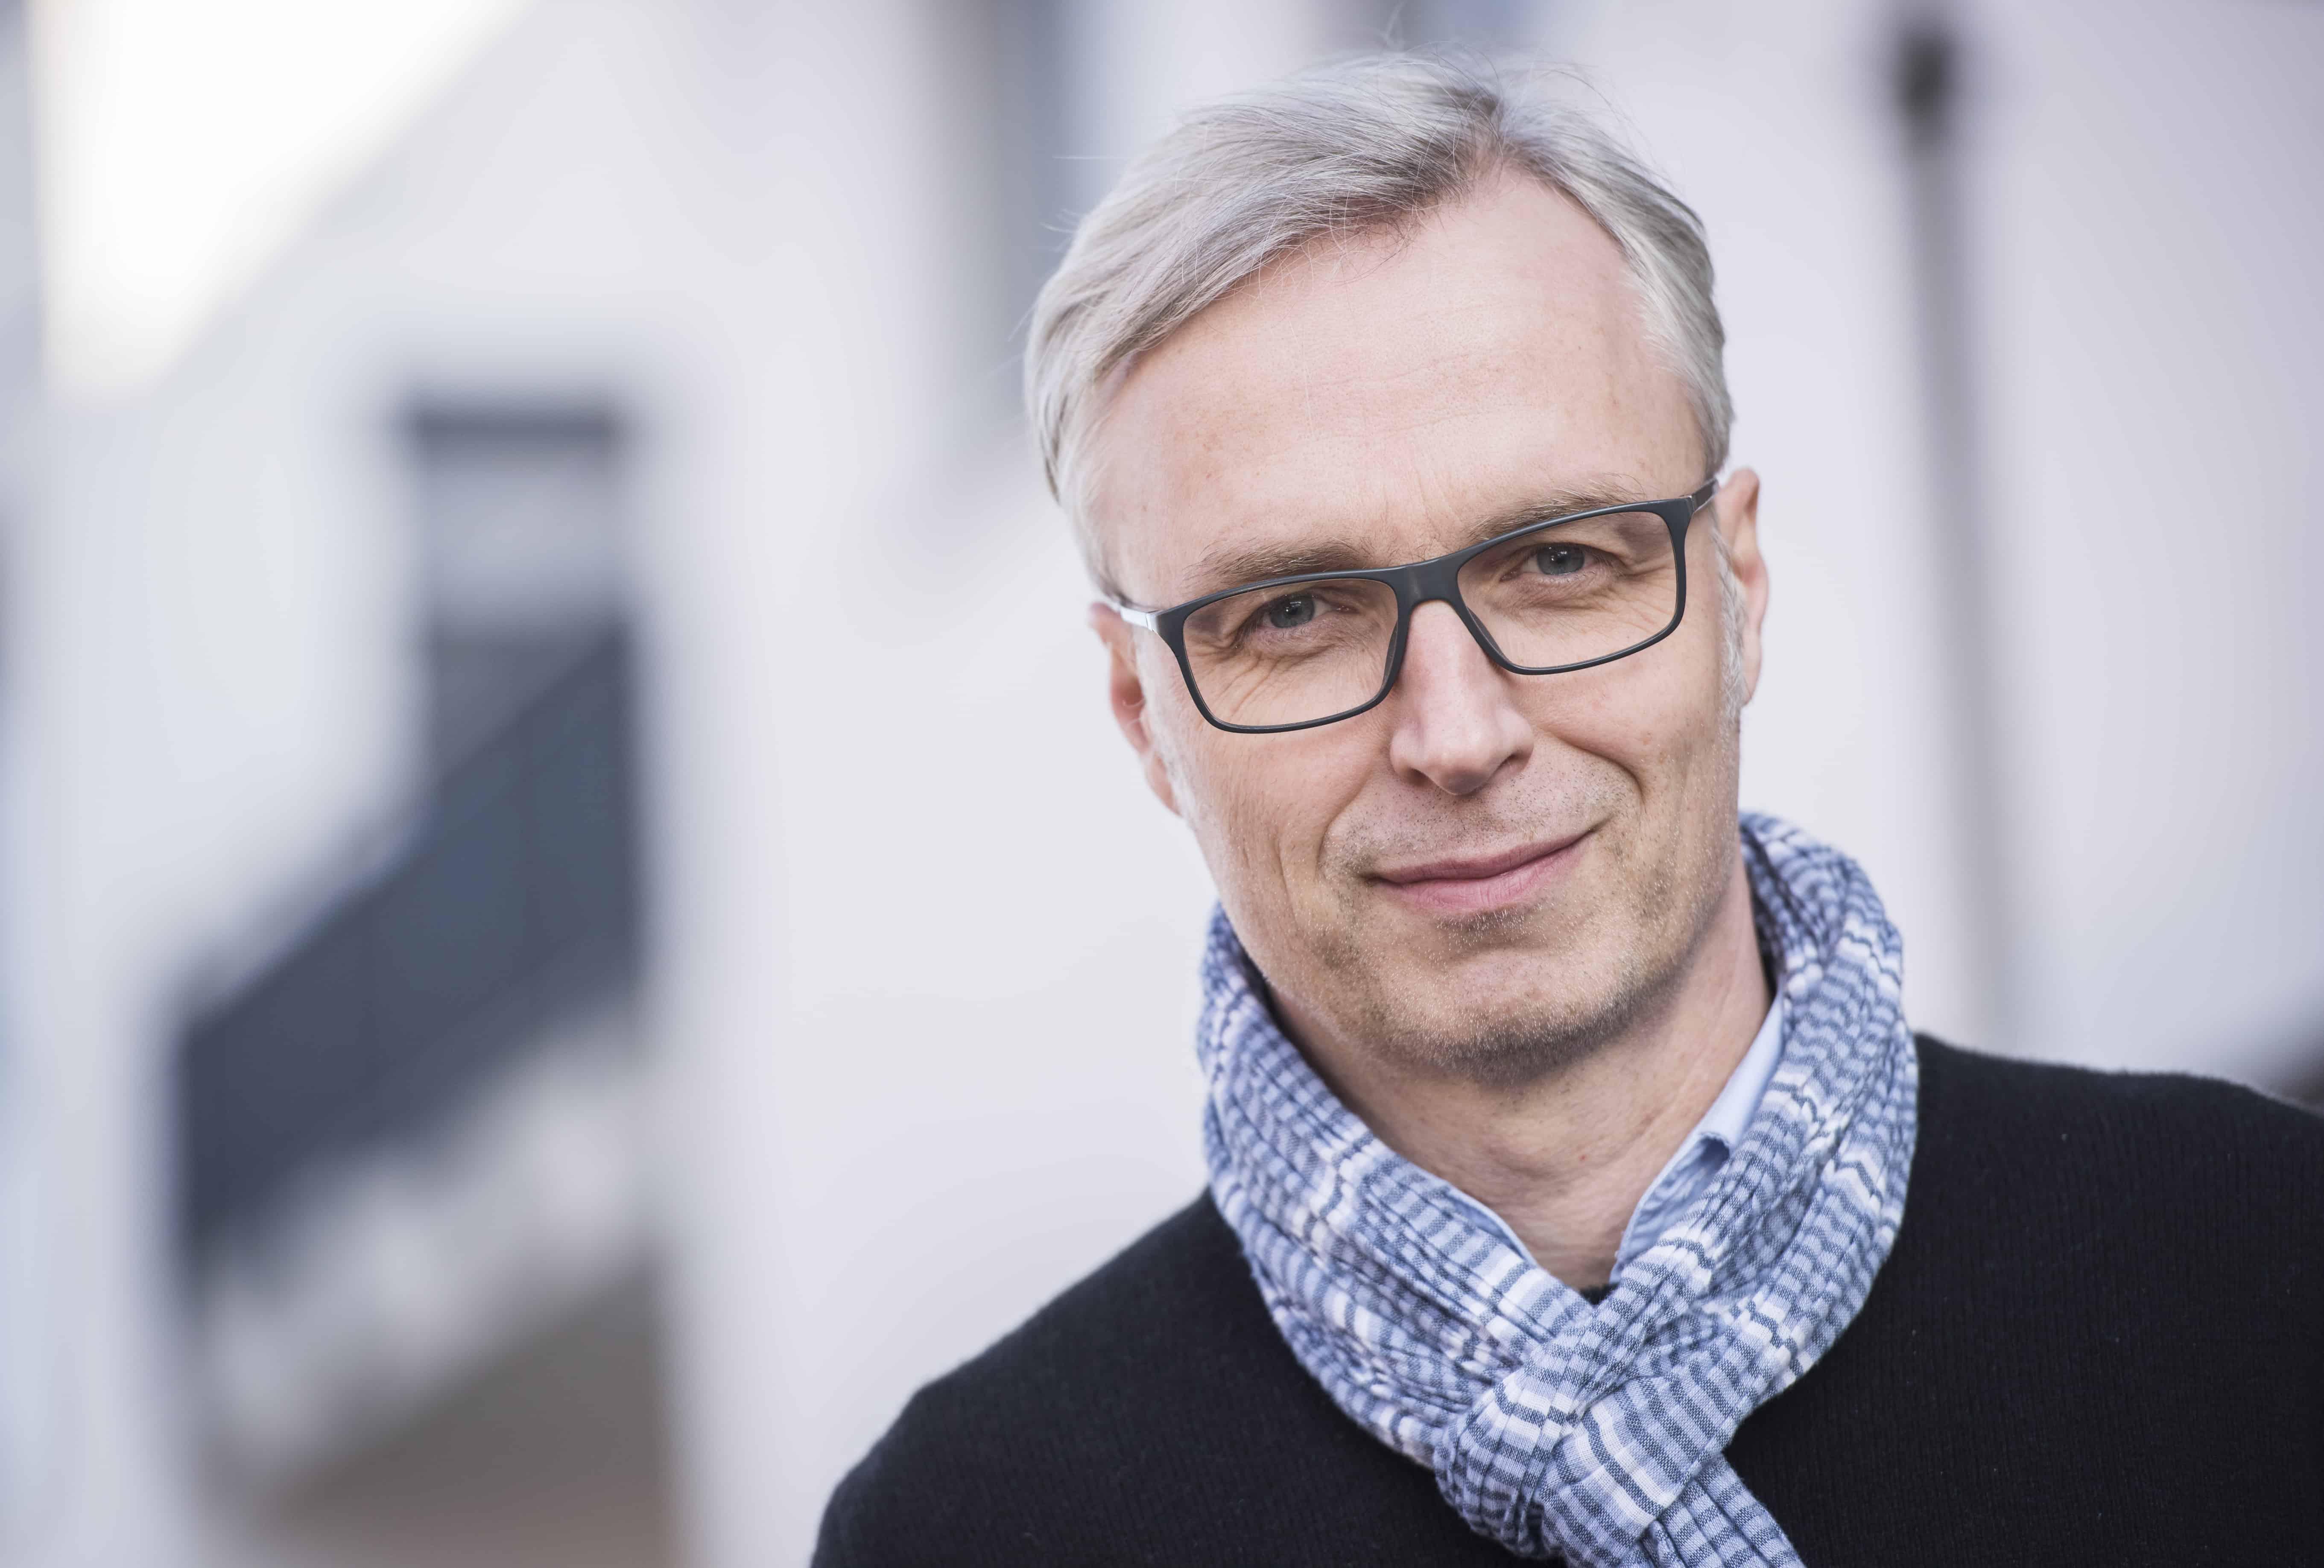 Dr. Rainer Schacke